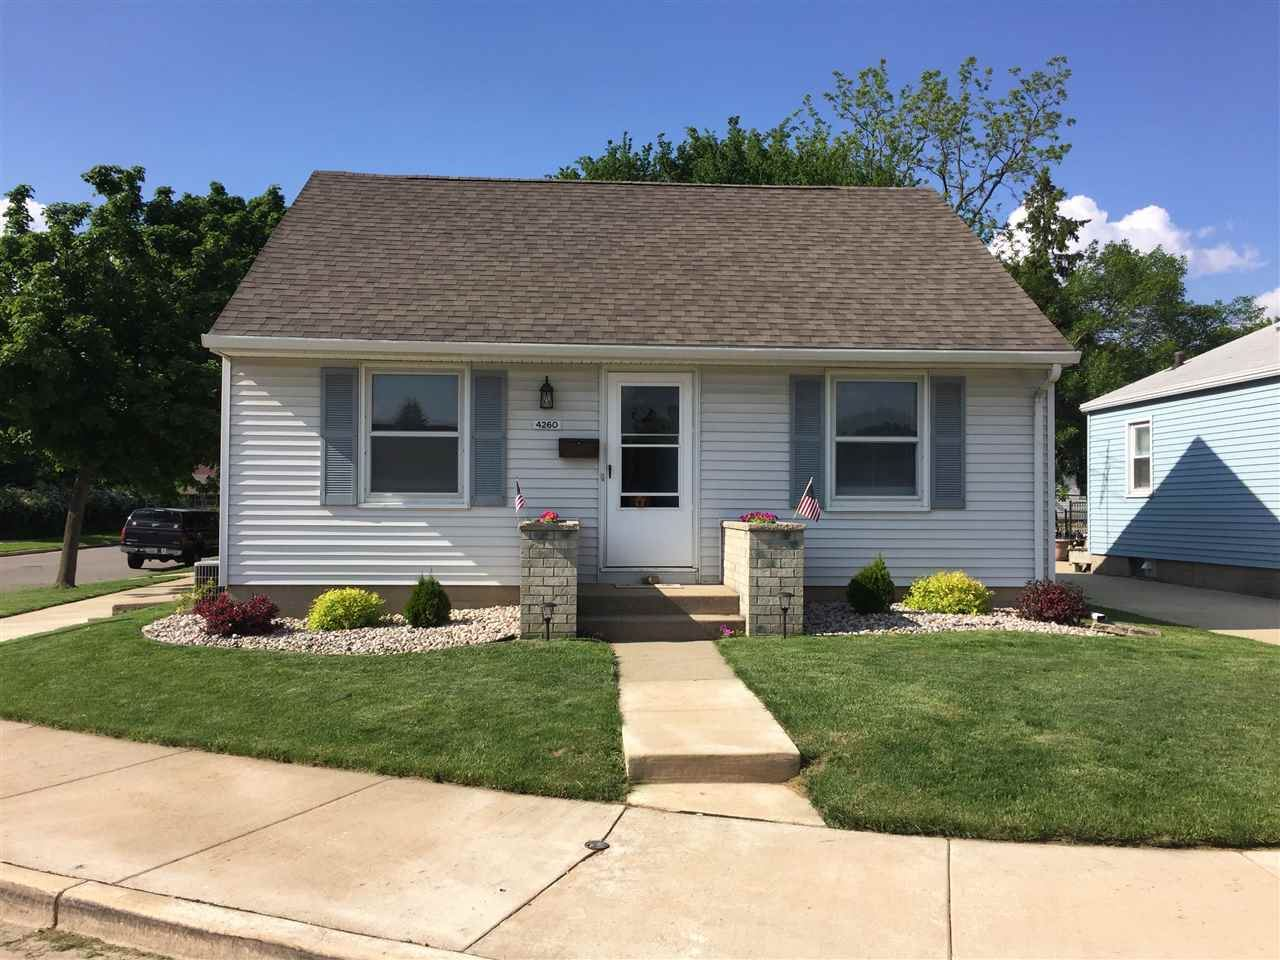 4260 Warwick Way, Madison, WI 53711 - MLS#: 1902485